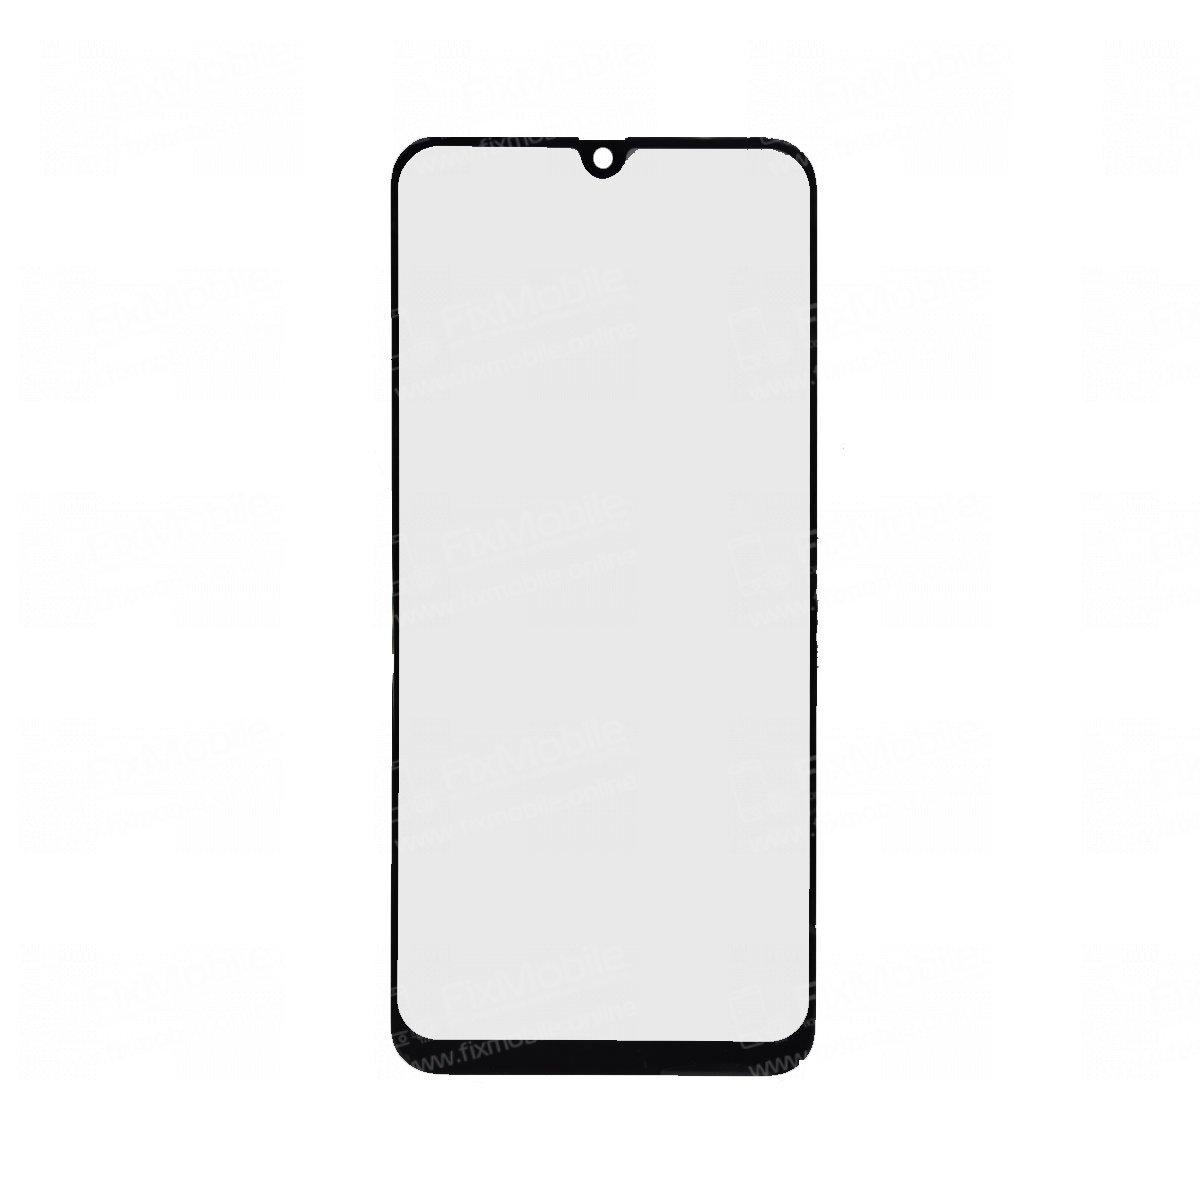 Стекло для Samsung Galaxy A50 (A505F) (черное)